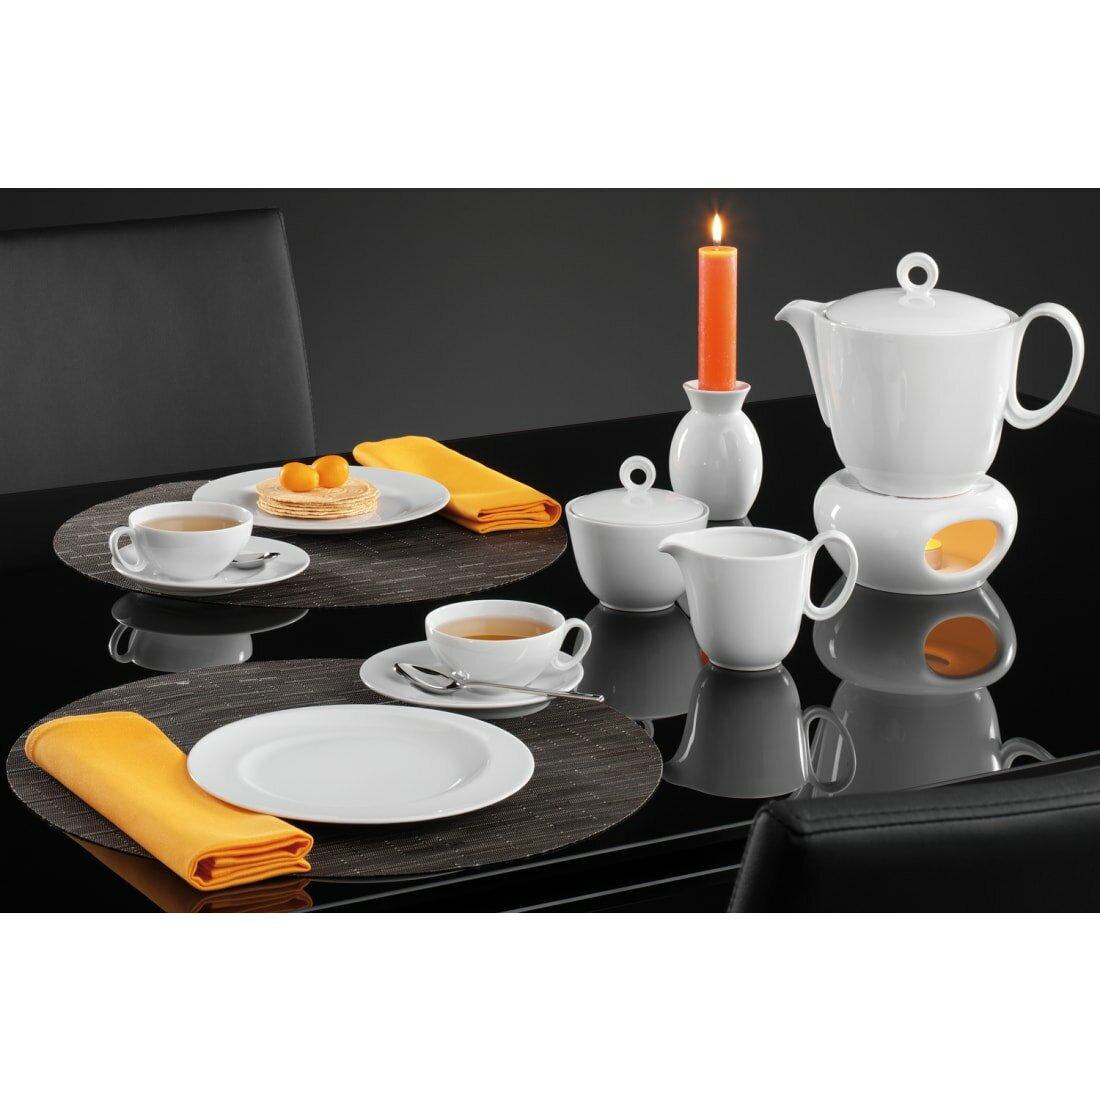 seltmann weiden 16 tlg tafelservice paso aus porzellan bewertungen. Black Bedroom Furniture Sets. Home Design Ideas